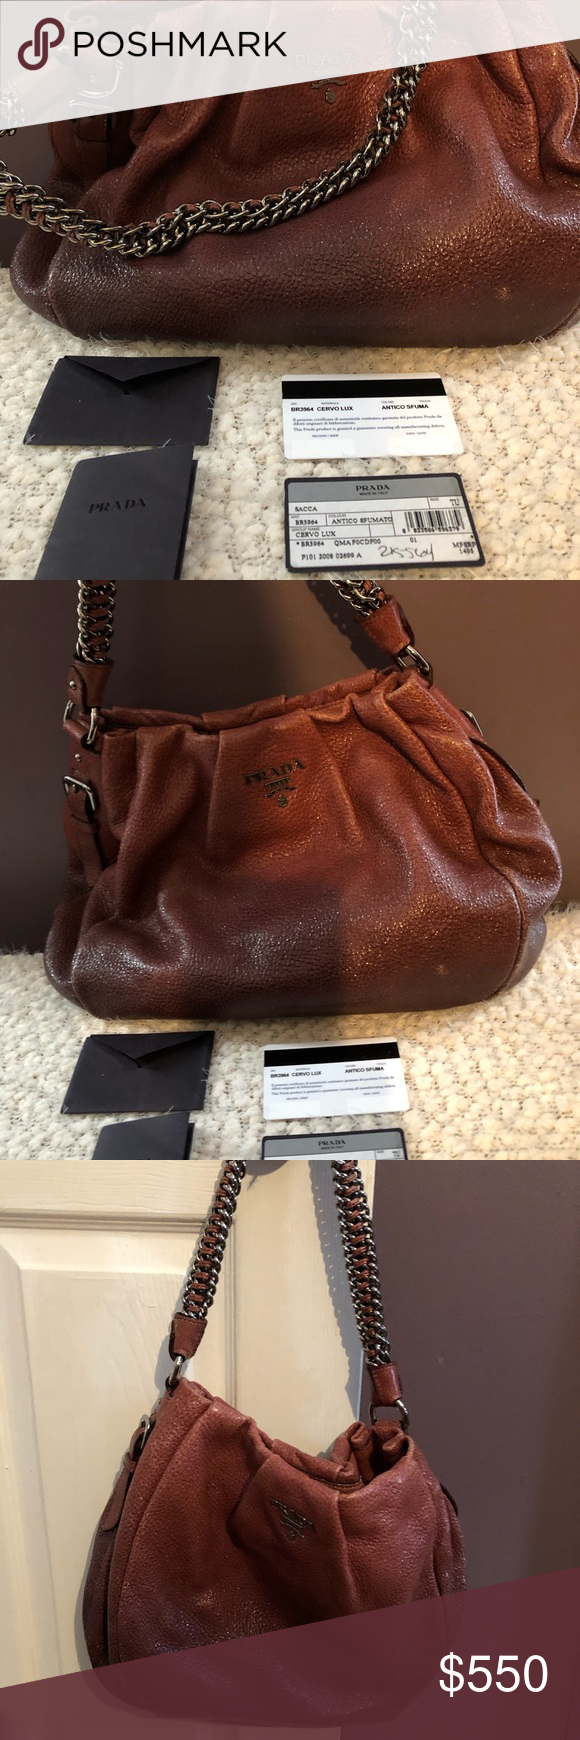 75fabbac75f2f Prada handbag sfumata antico Beautiful Prada Cervo lux handbag with chain  and leather strap. Stays